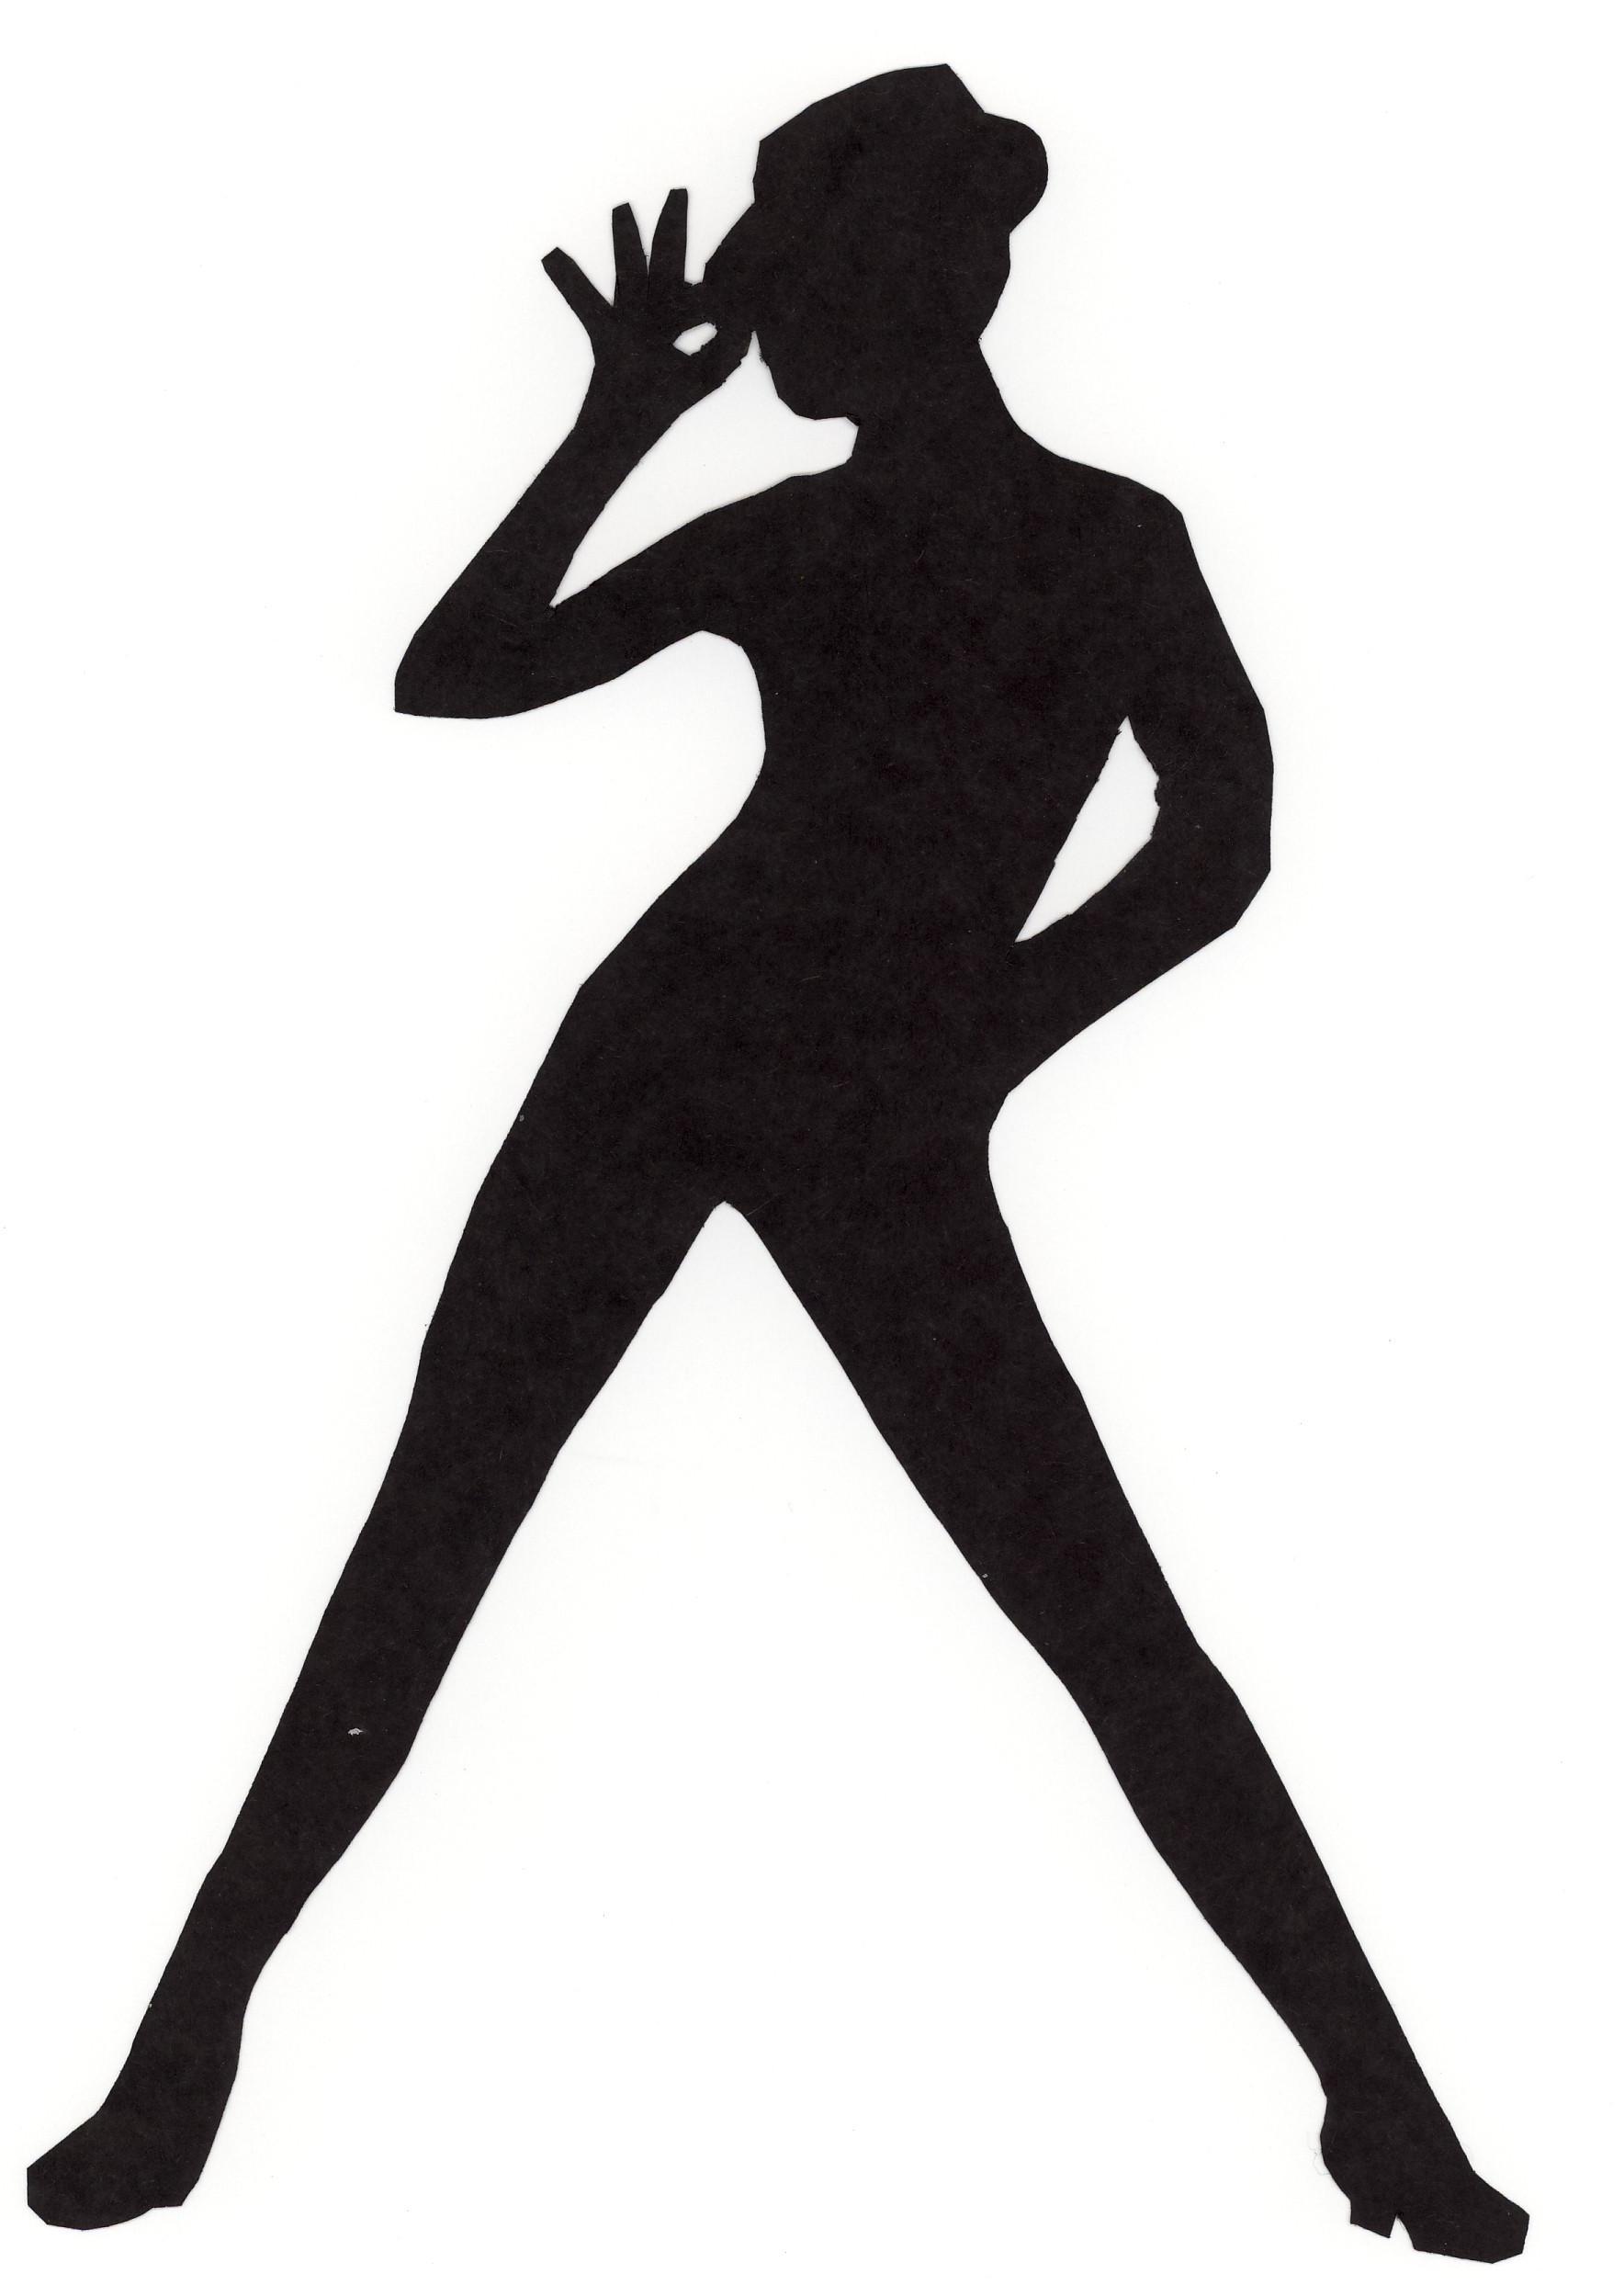 hight resolution of 1768x2487 jazz dance clipart